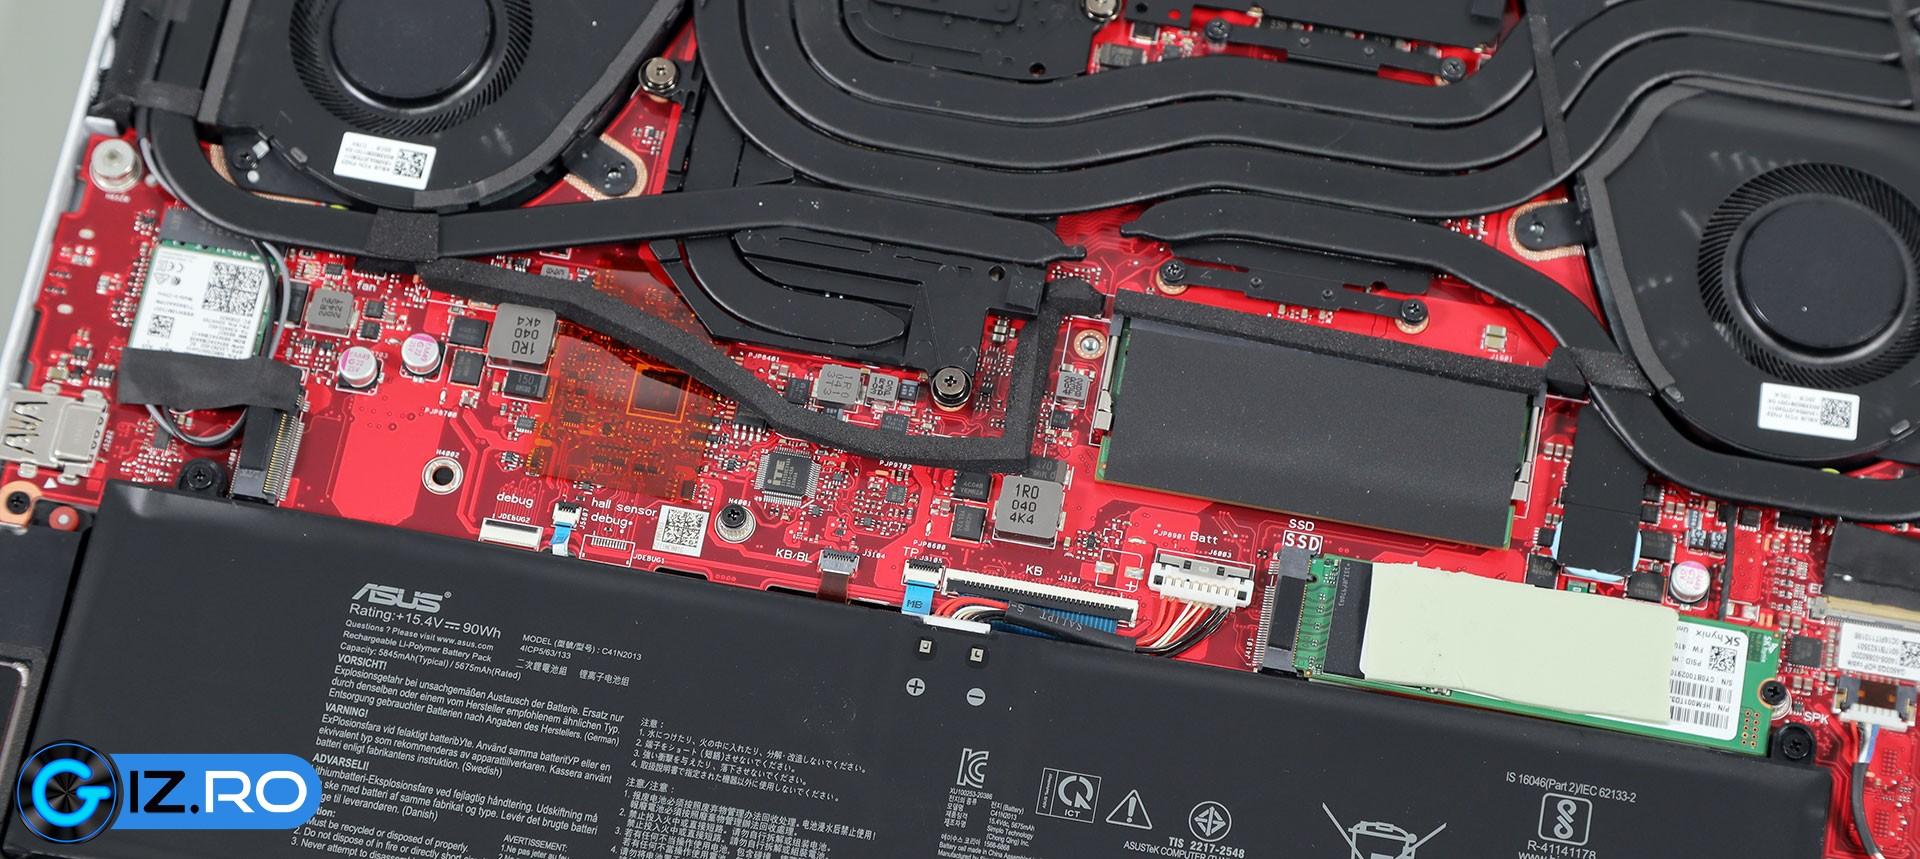 asus-rog-zephyrus-g15-internals-ram-storage